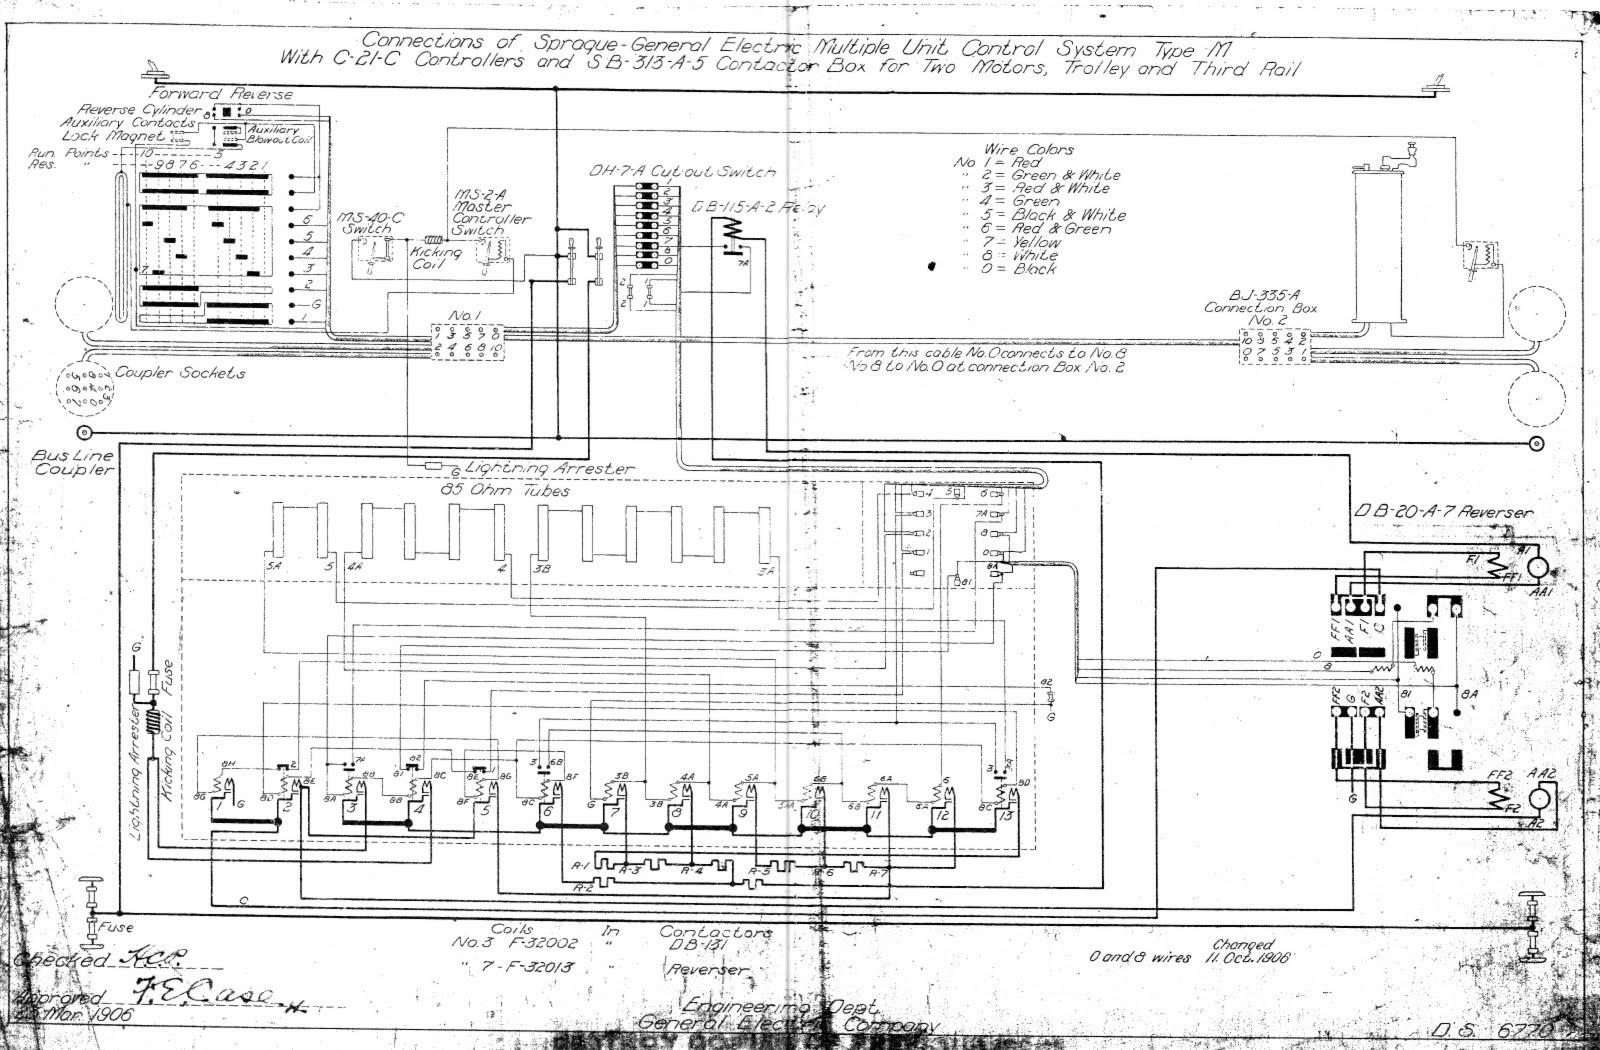 medium resolution of 1984 dodge 318 ignition wiring diagram 0900c1528006af87 likewise moreover together with moreover